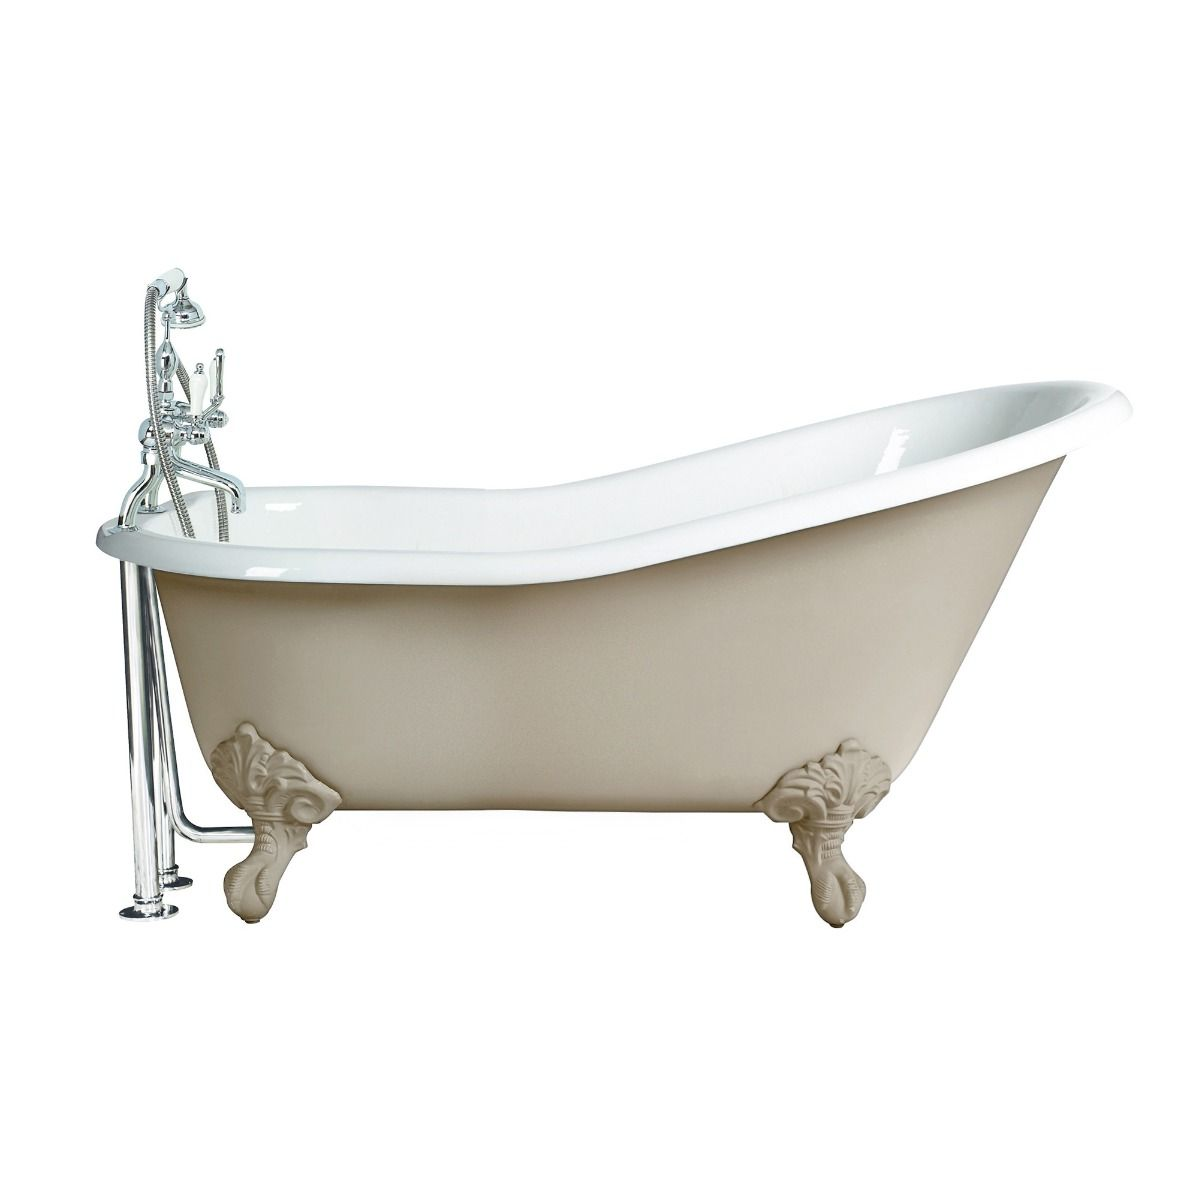 Versailles Slipper Bath 154